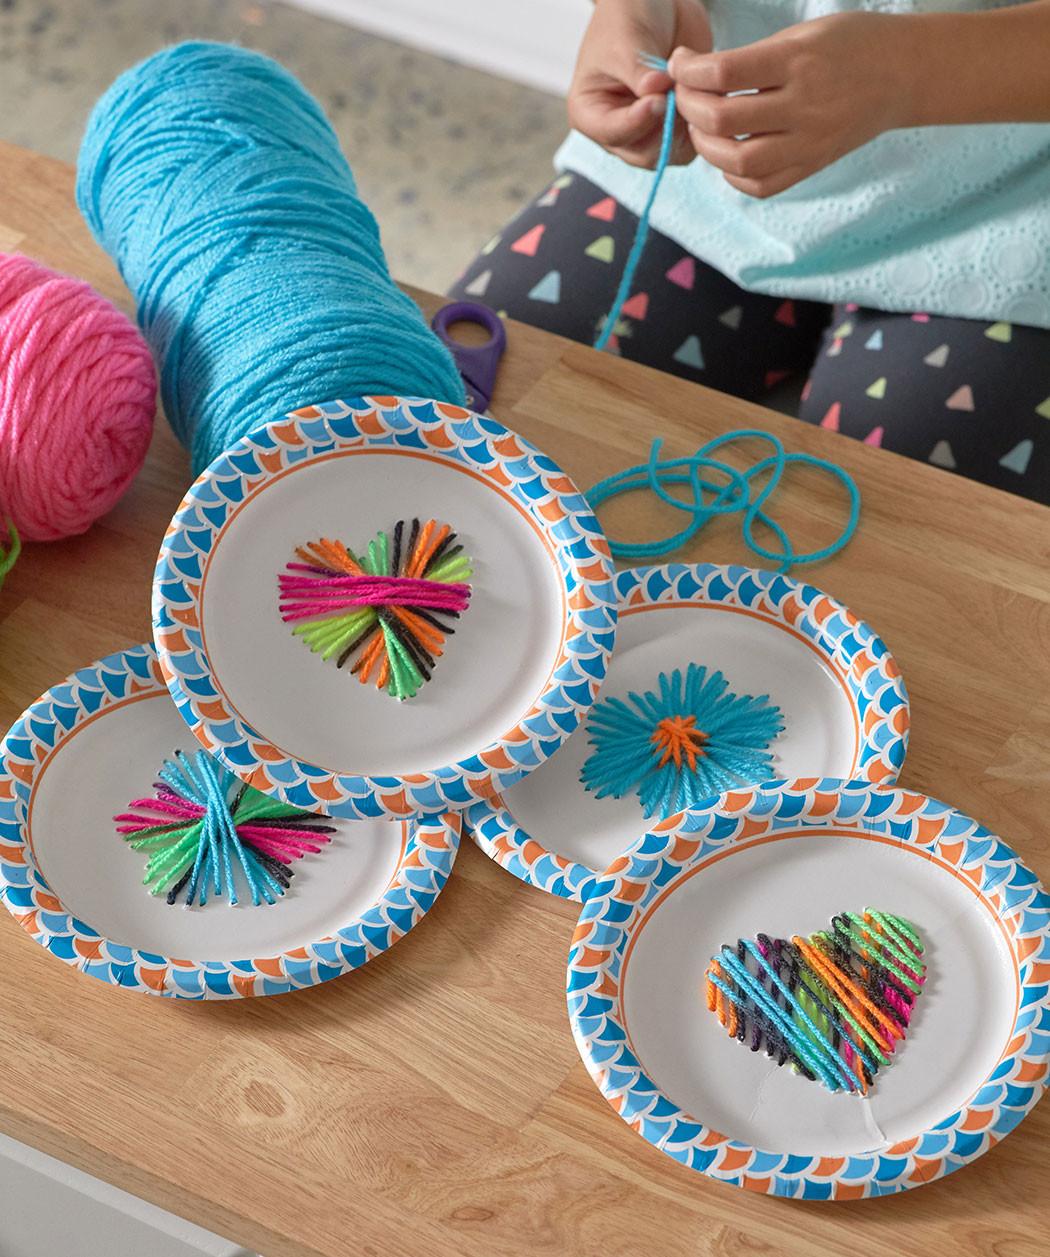 Best ideas about Crafts Fir Kids . Save or Pin 18 Cool Kids Crafts Ideas Now.